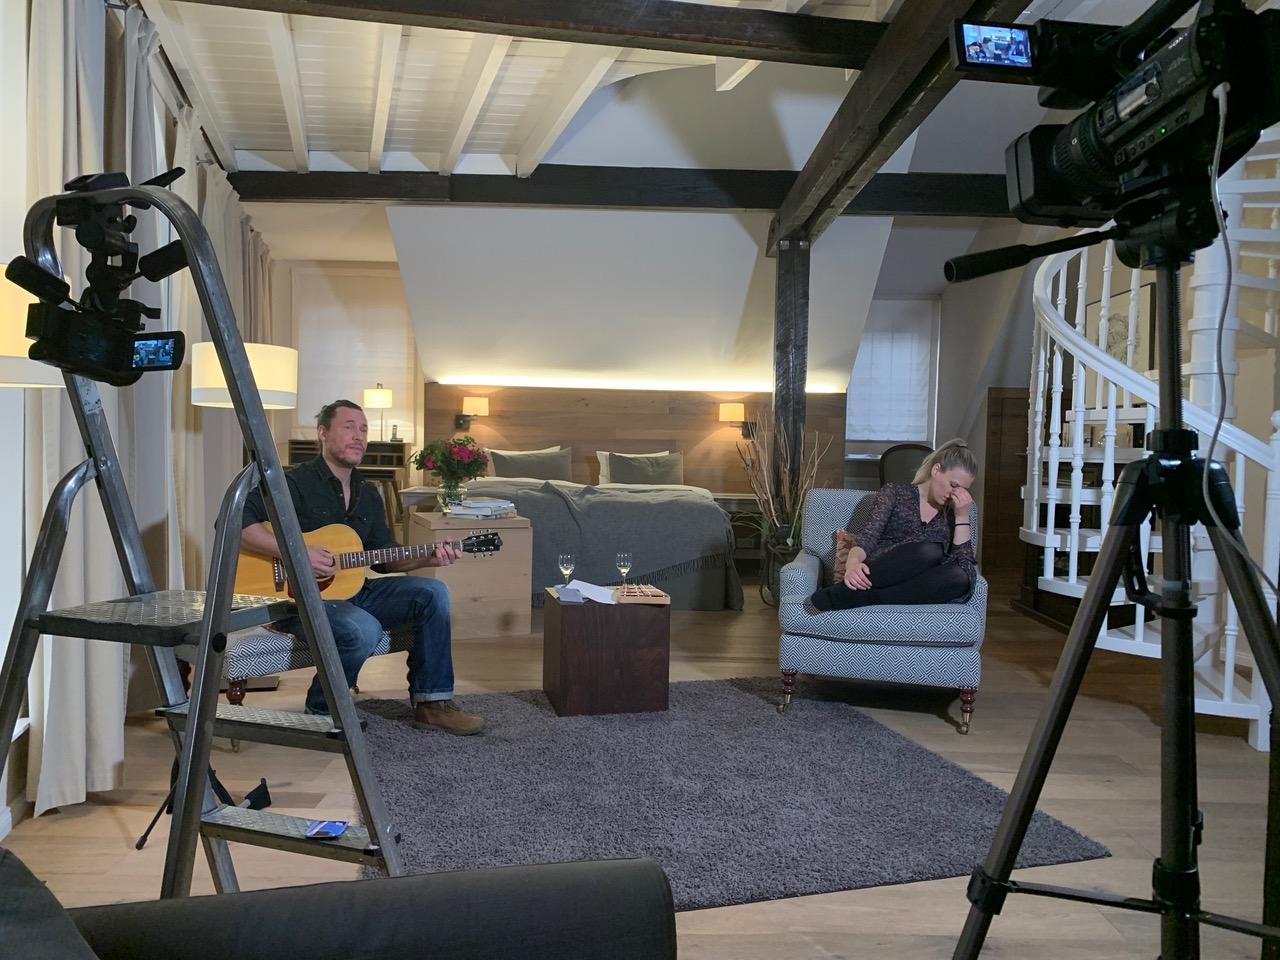 Künstler Lübeck Hotel Video